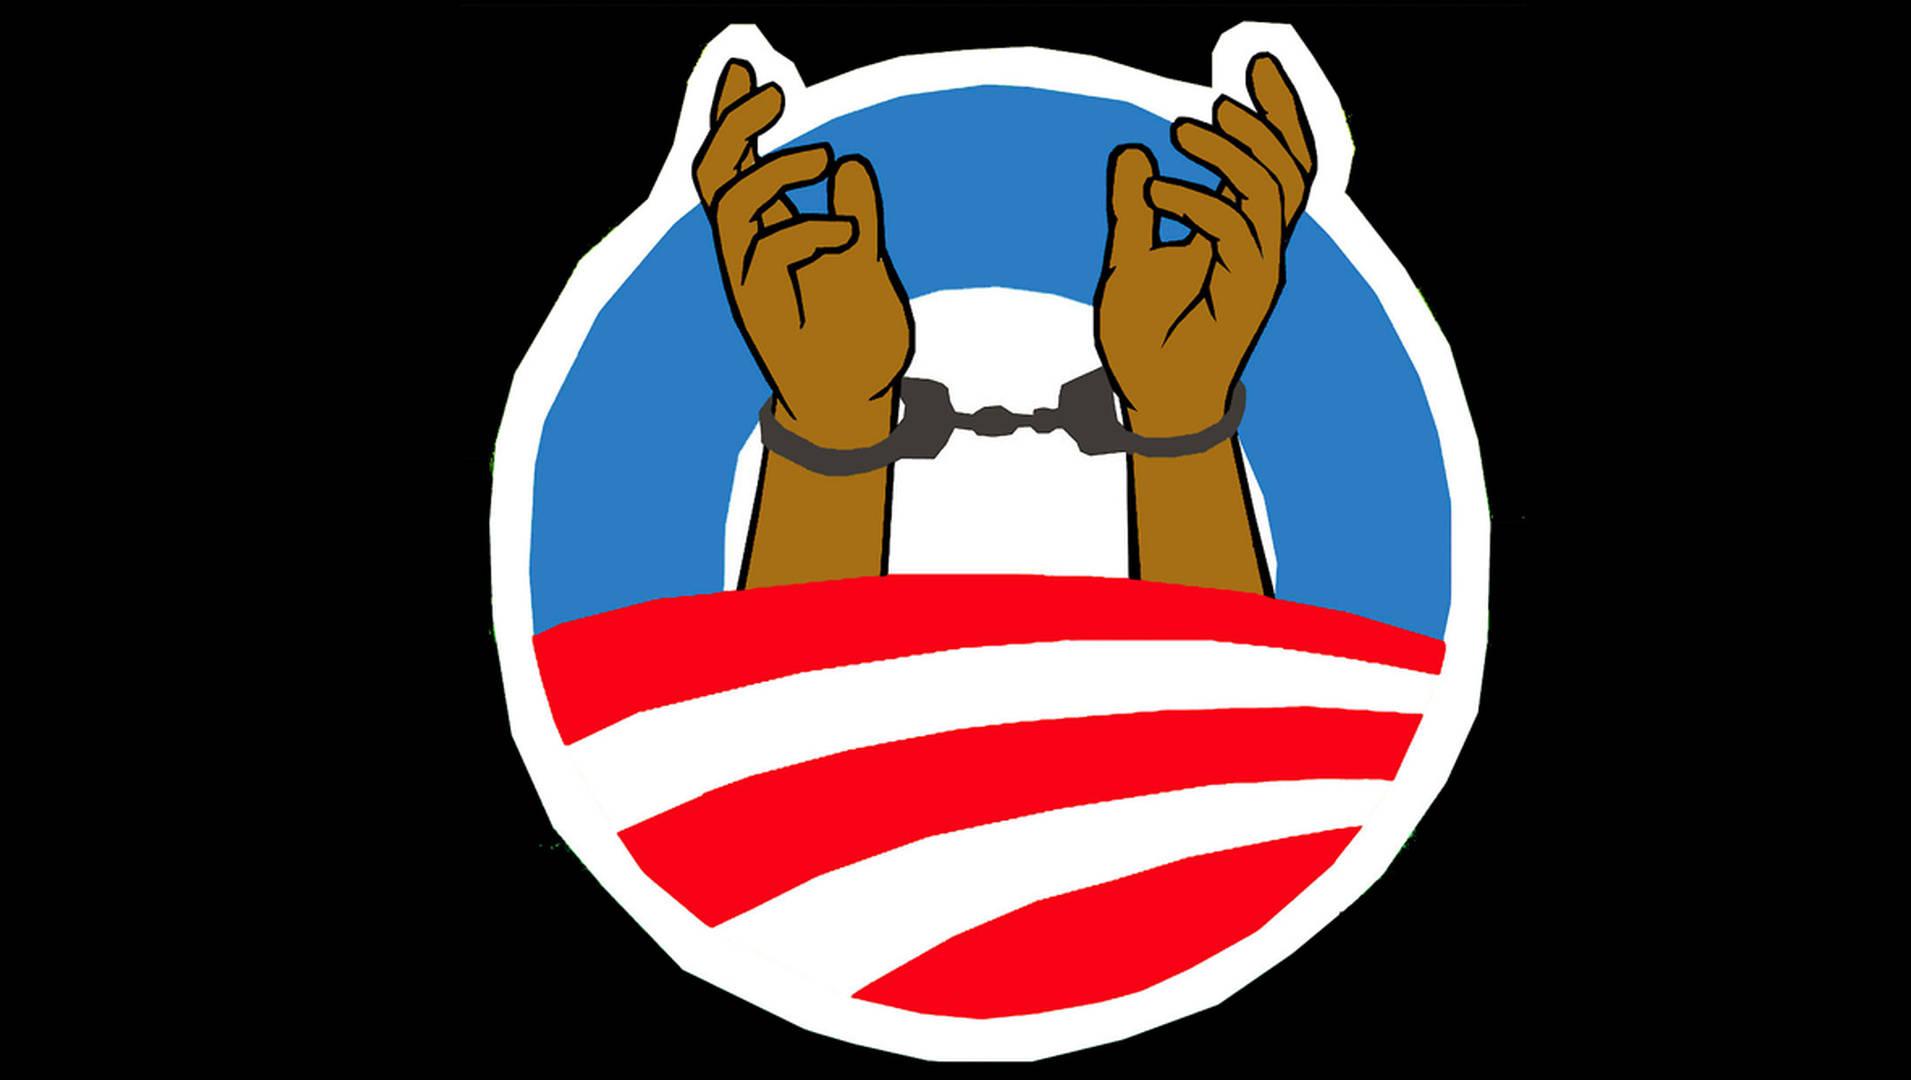 Immigration clipart deportation, Immigration deportation.